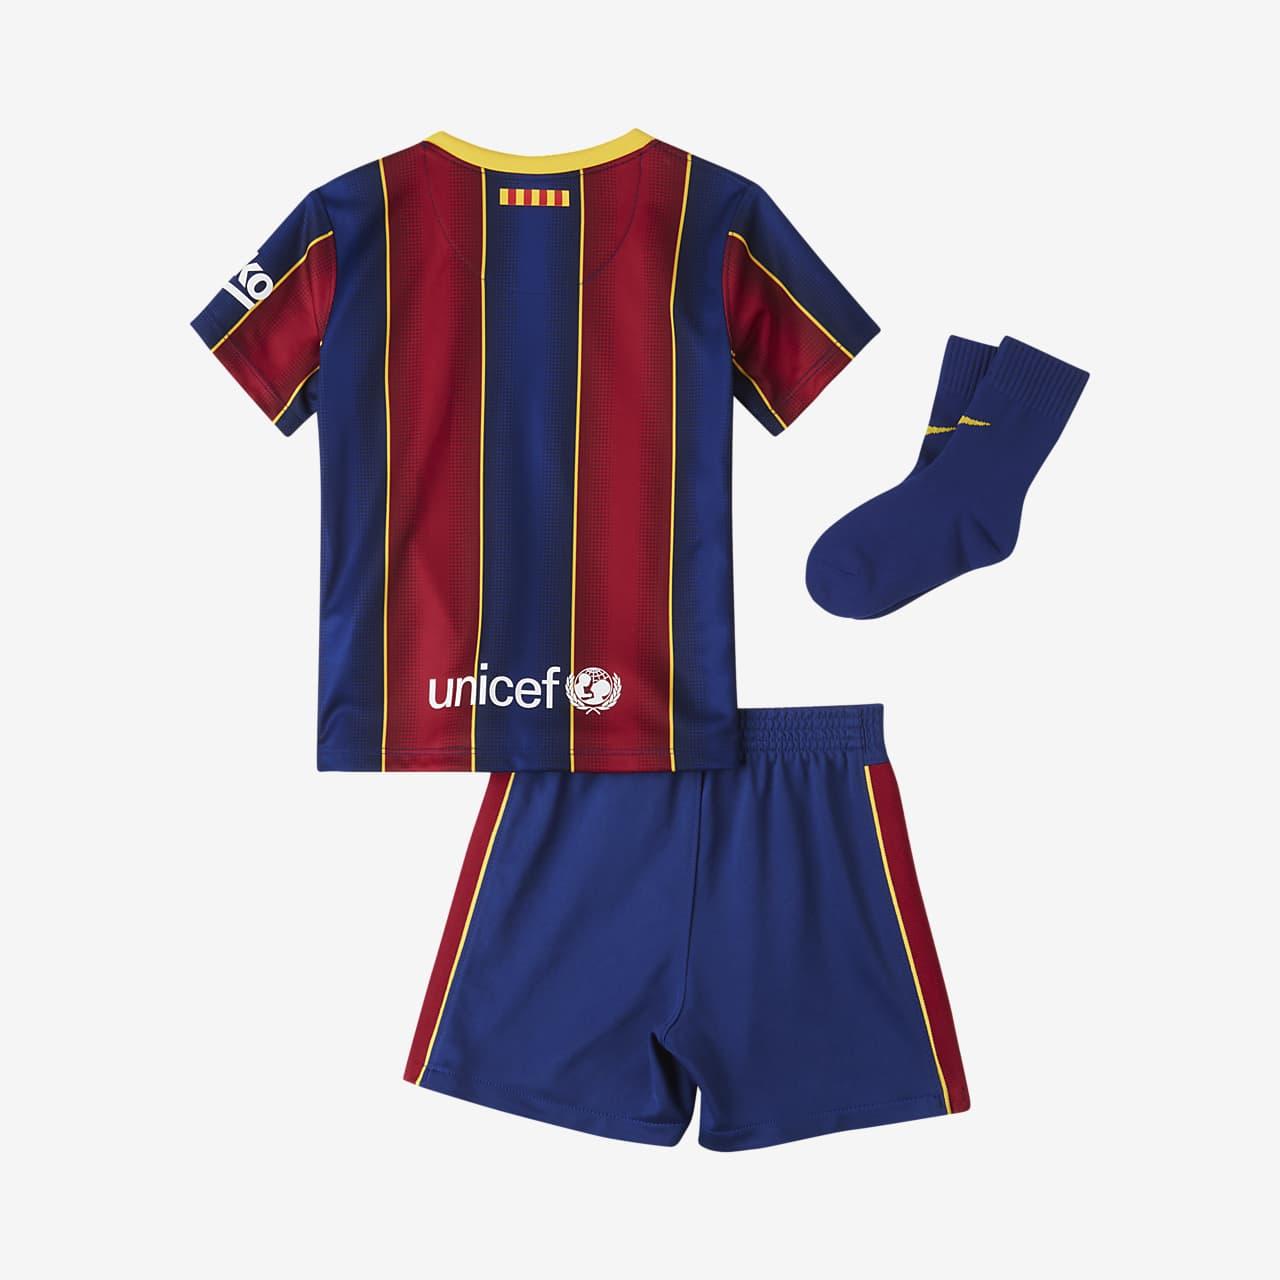 F C Barcelona 2020 21 Home Baby And Toddler Football Kit Nike Lu